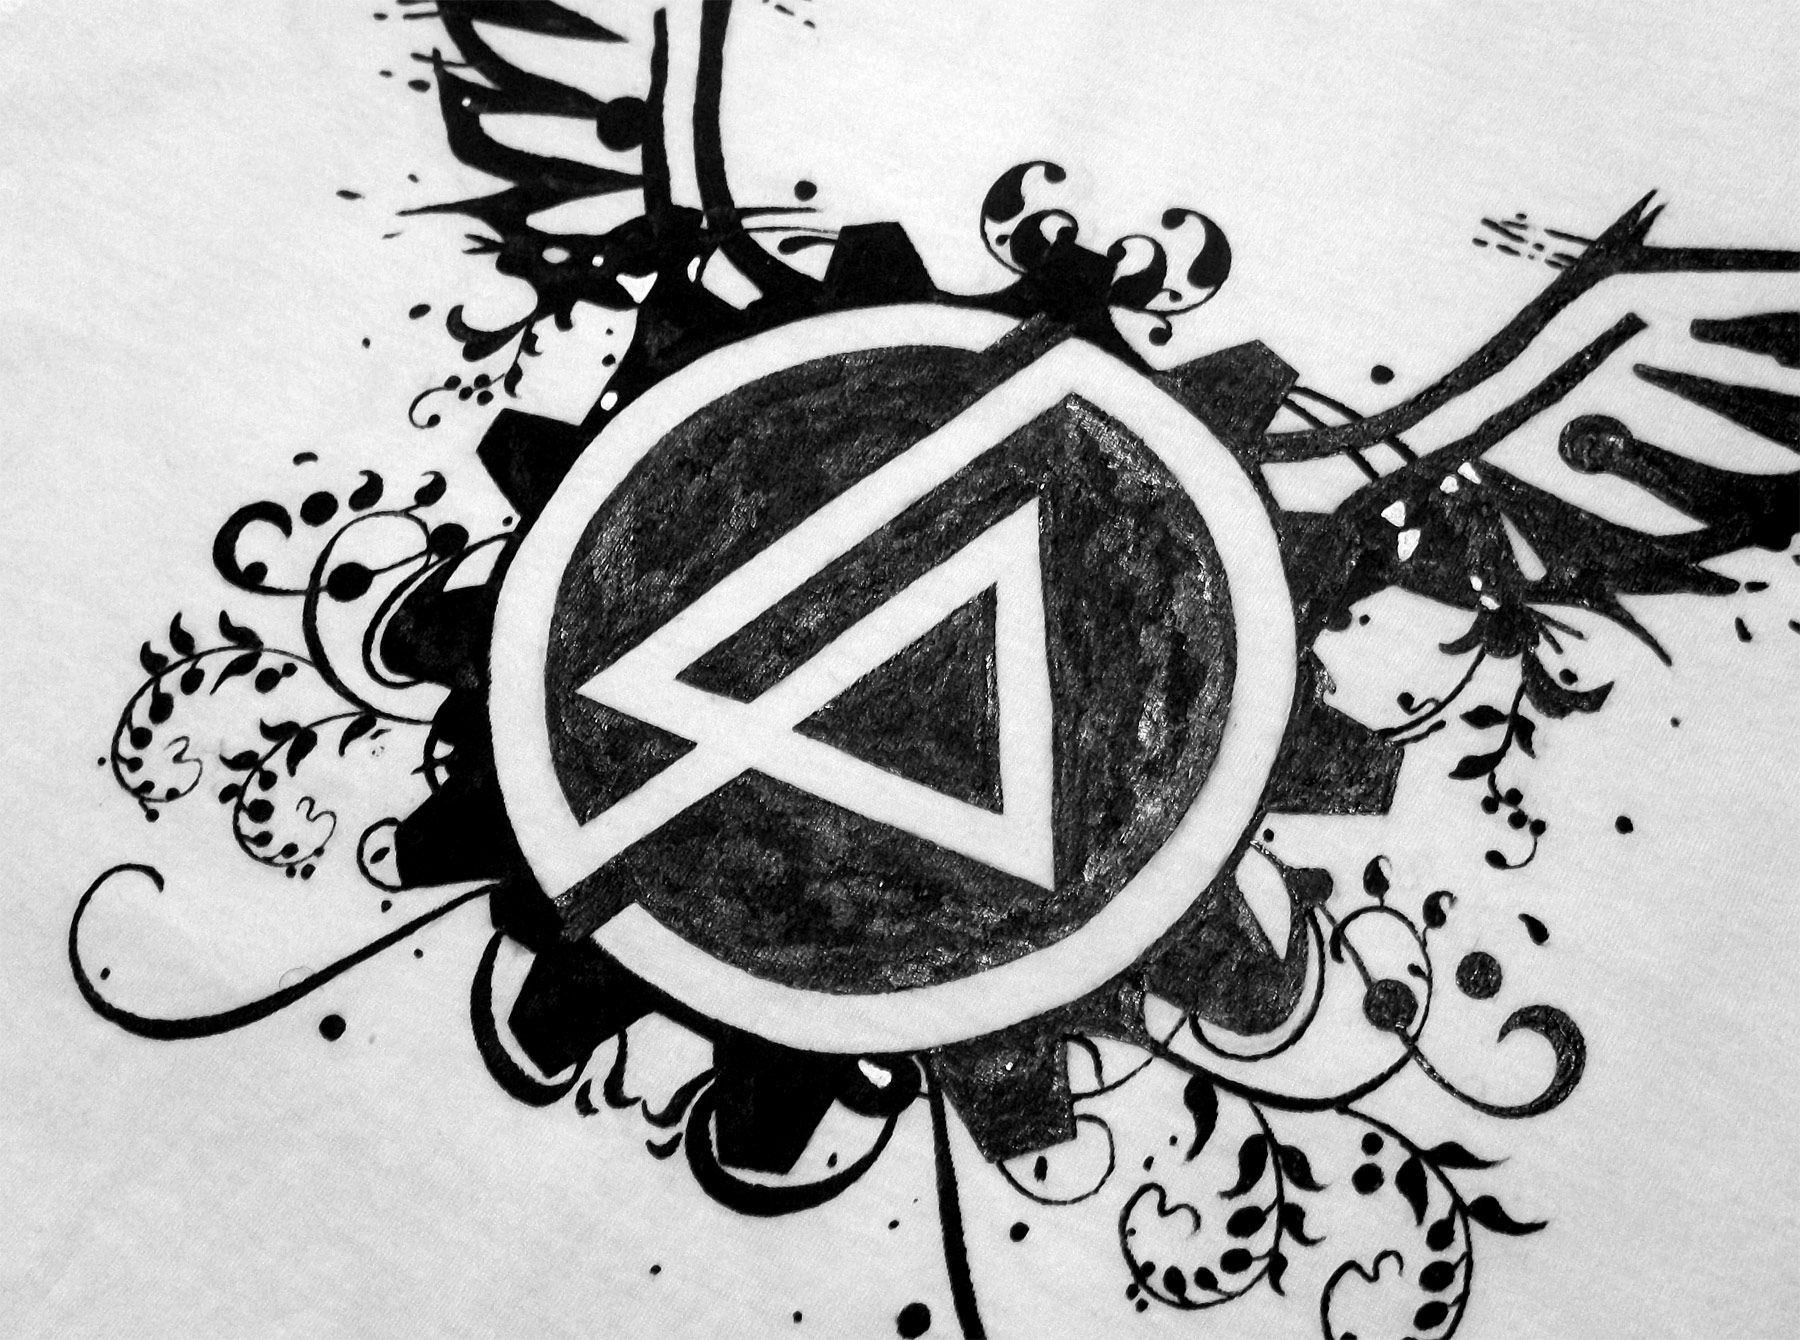 Linkin park symbol google search music pinterest linkin park linkin park symbol google search biocorpaavc